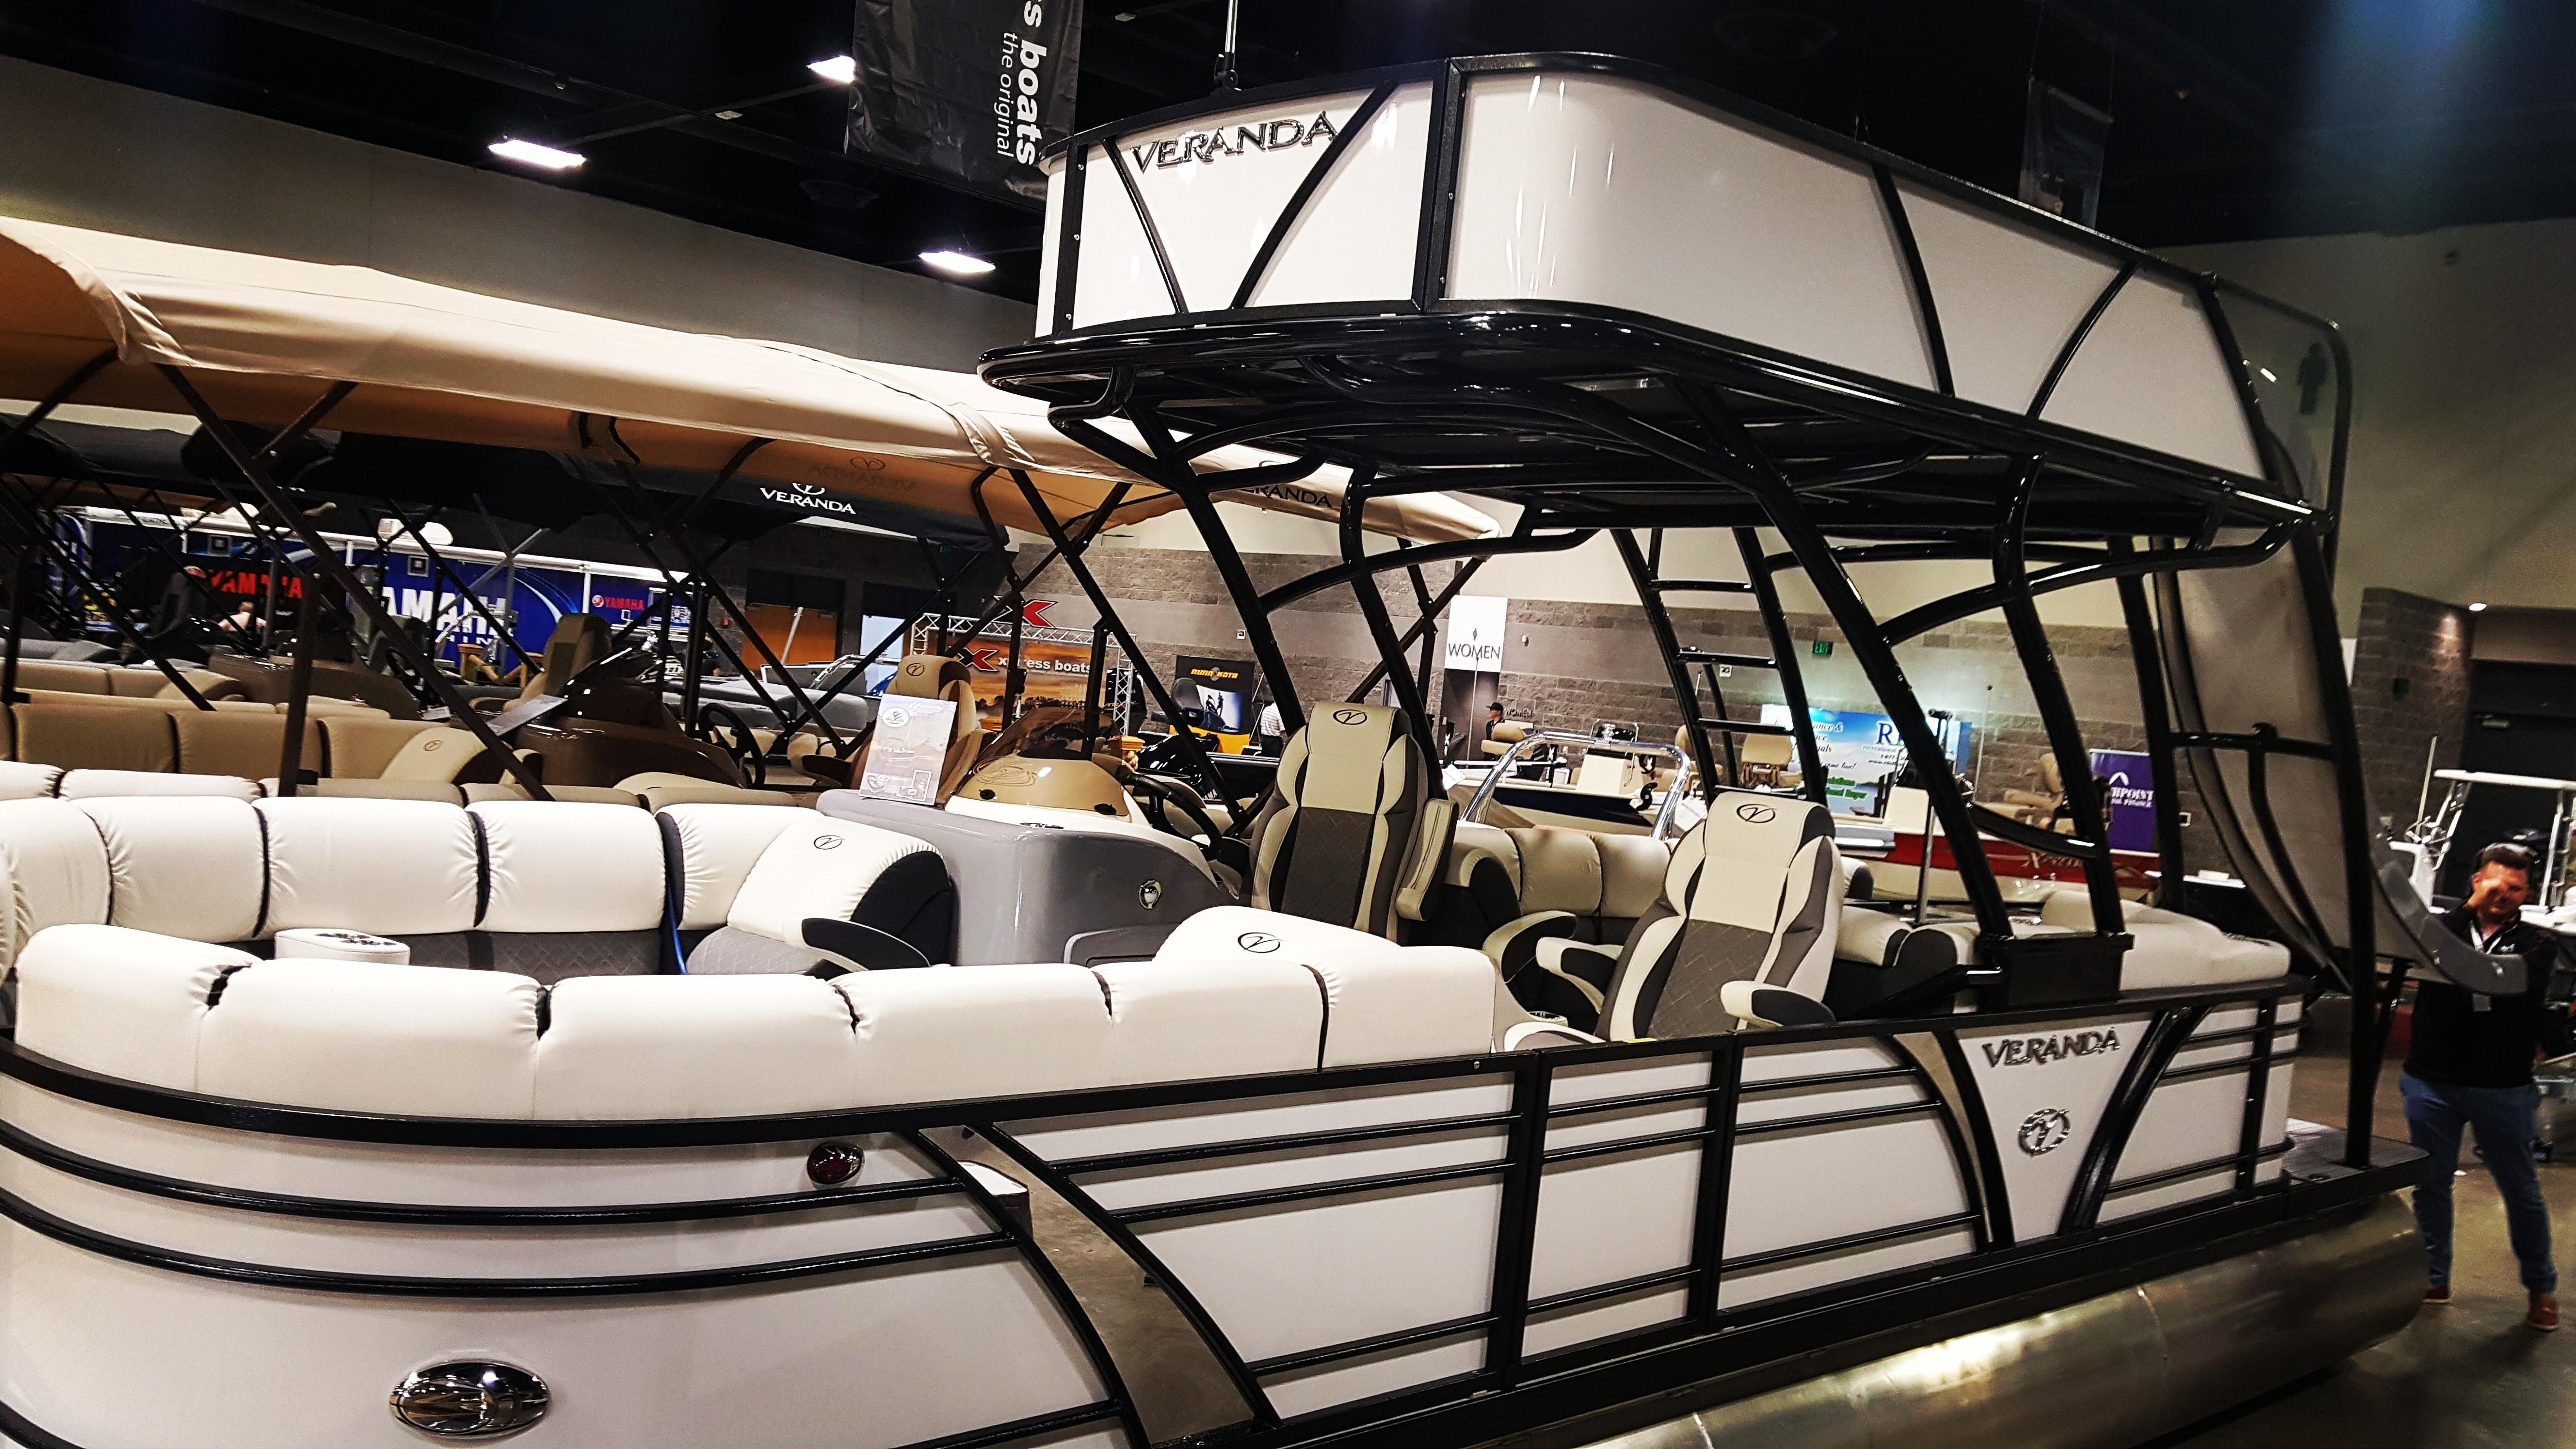 Veranda 2018  2018 Veranda VP25HTS Power Boat For Sale - www.yachtworld.com